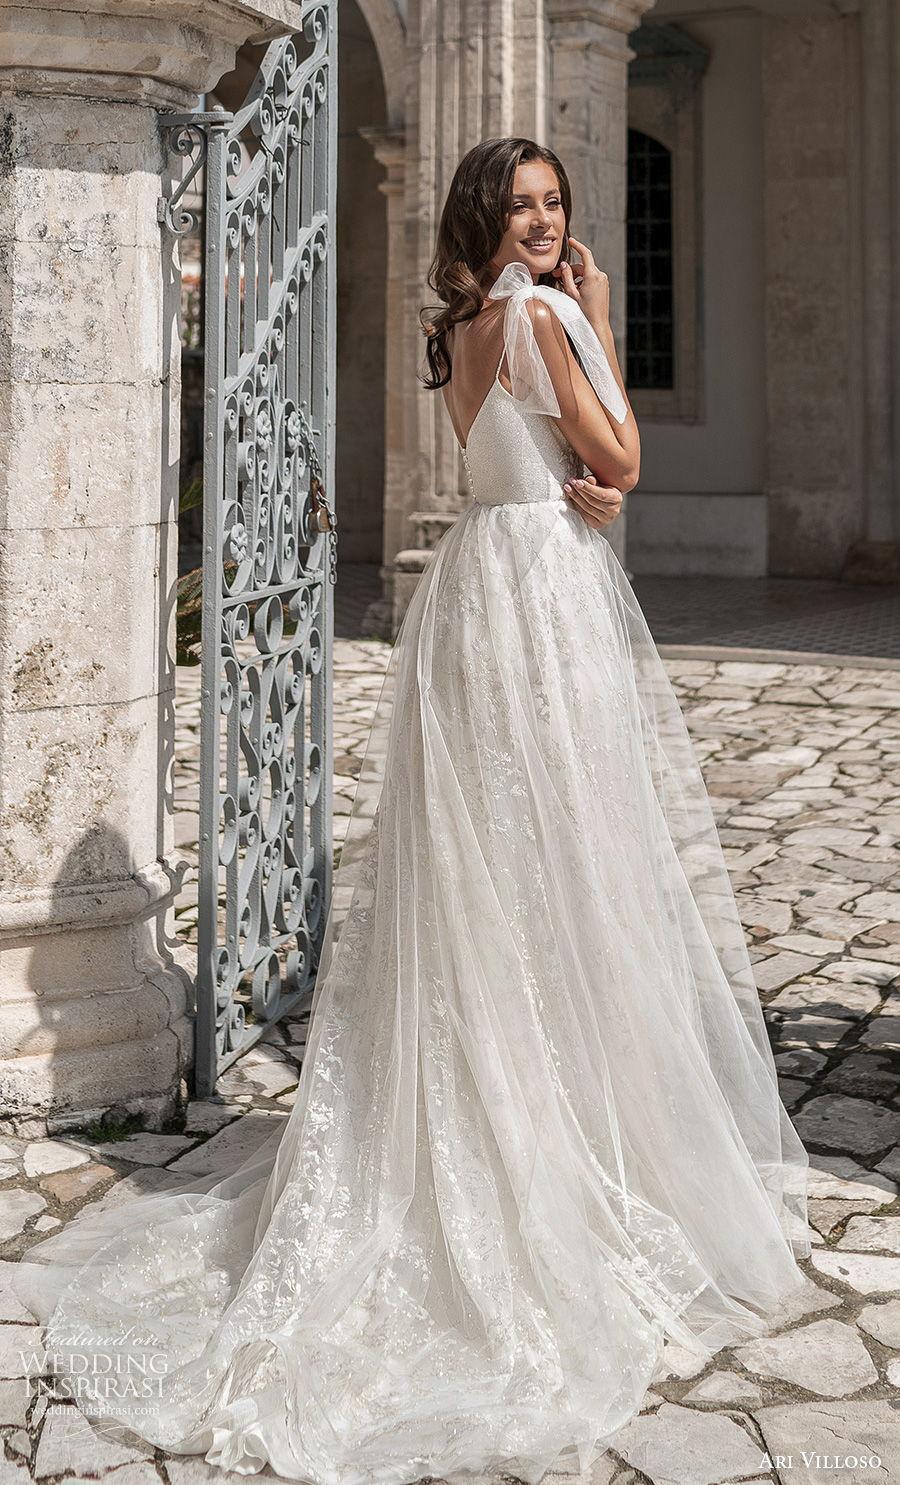 ari villoso 2021 bridal ribbon spaghetti strap diamond neckline full embellished bodice romantic a  line wedding dress v back medium train (12) bv